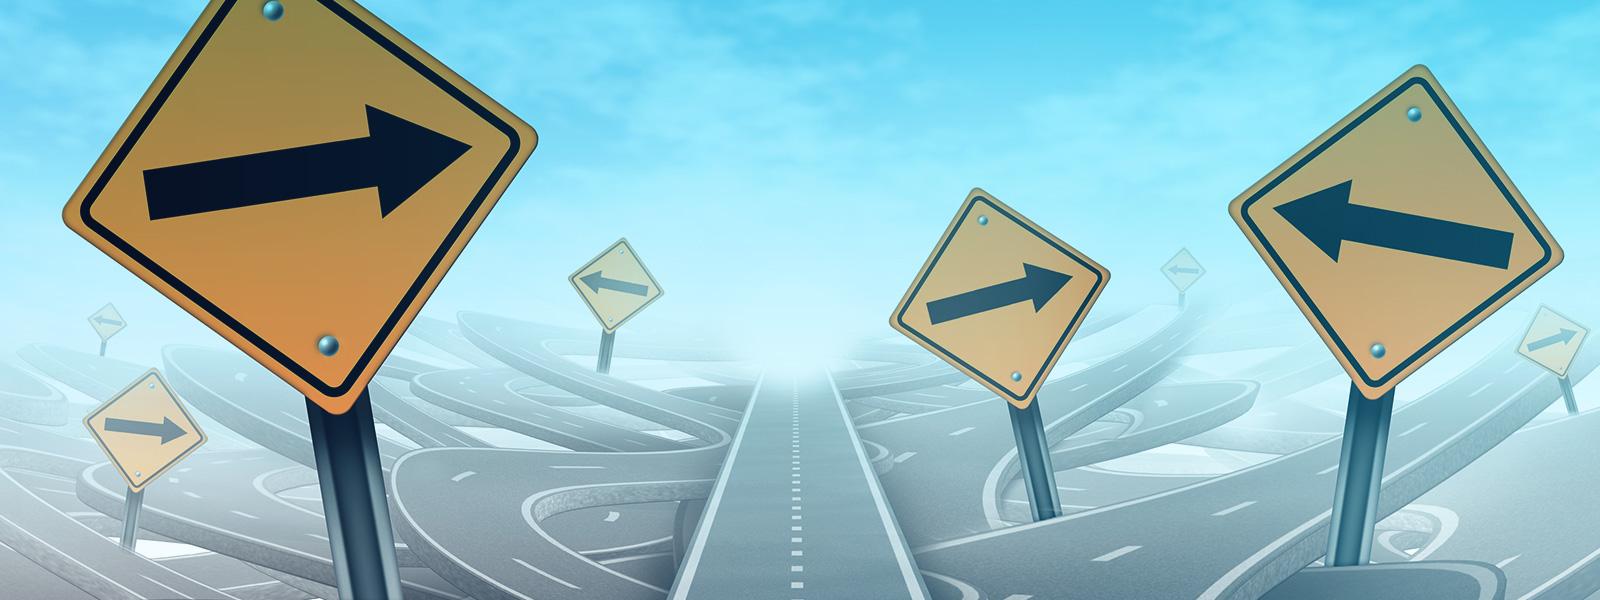 blog-ceabs-estradas-perigosas-brasil